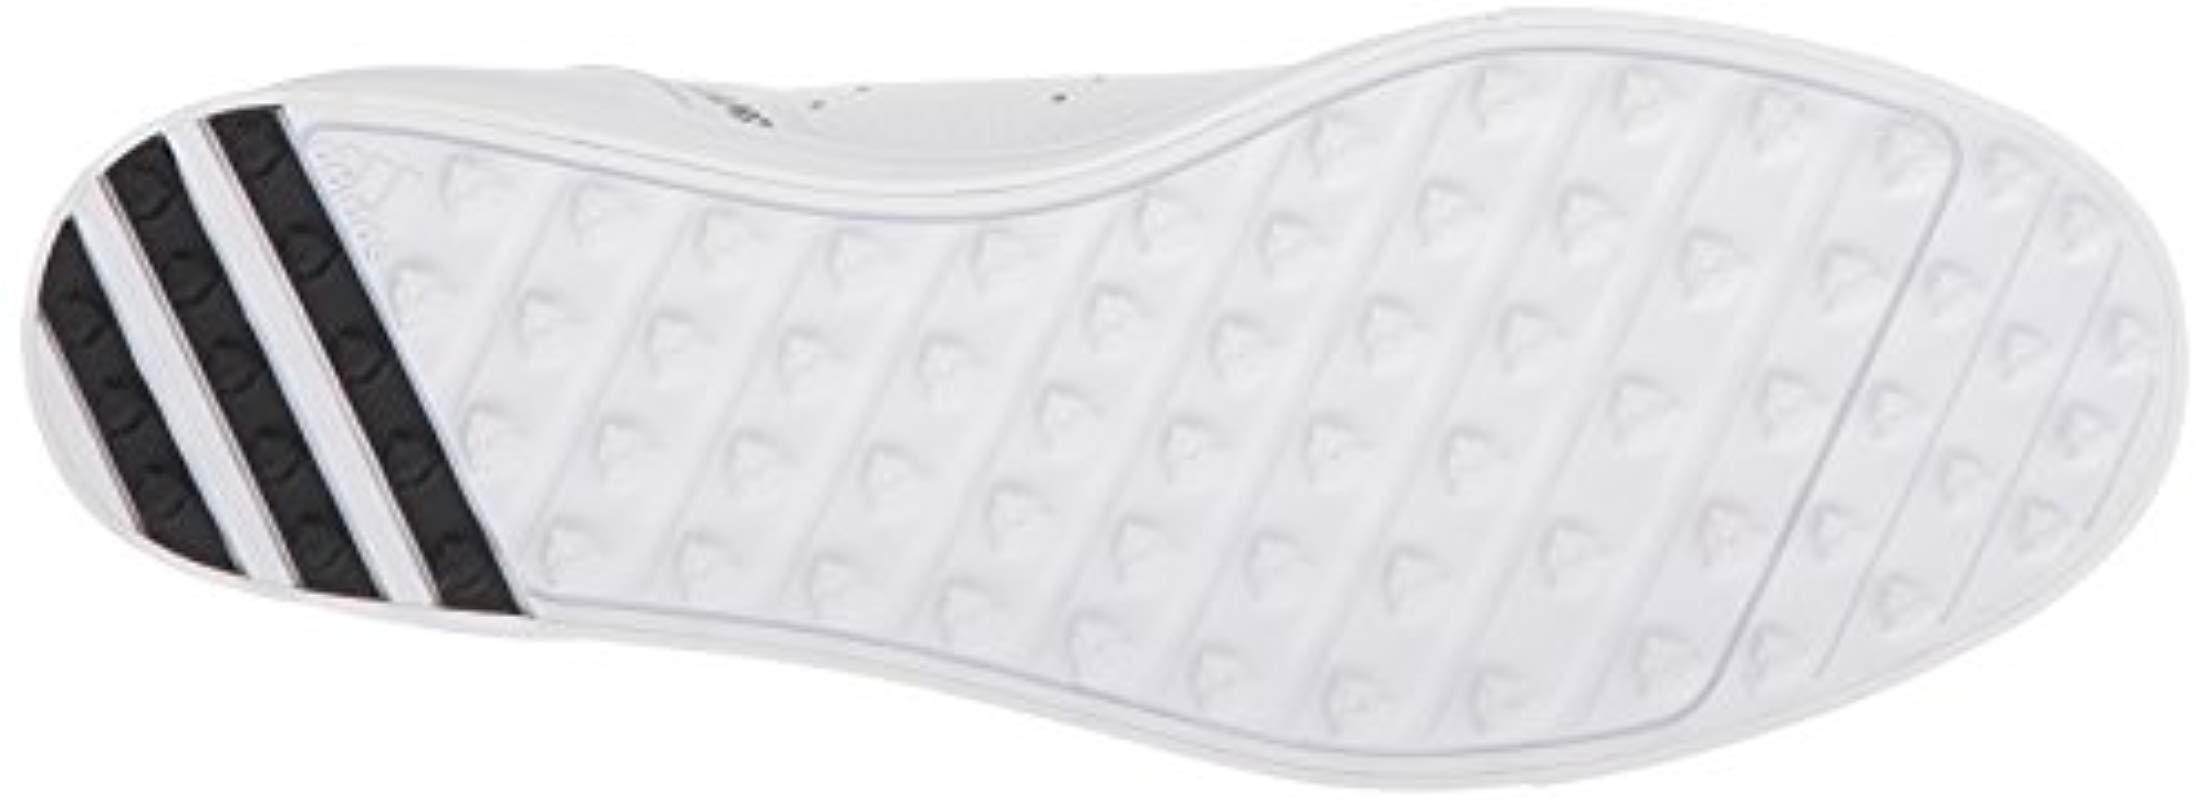 ca15b5d0ce68 Adidas - White Adicross Classic Golf Shoe for Men - Lyst. View fullscreen